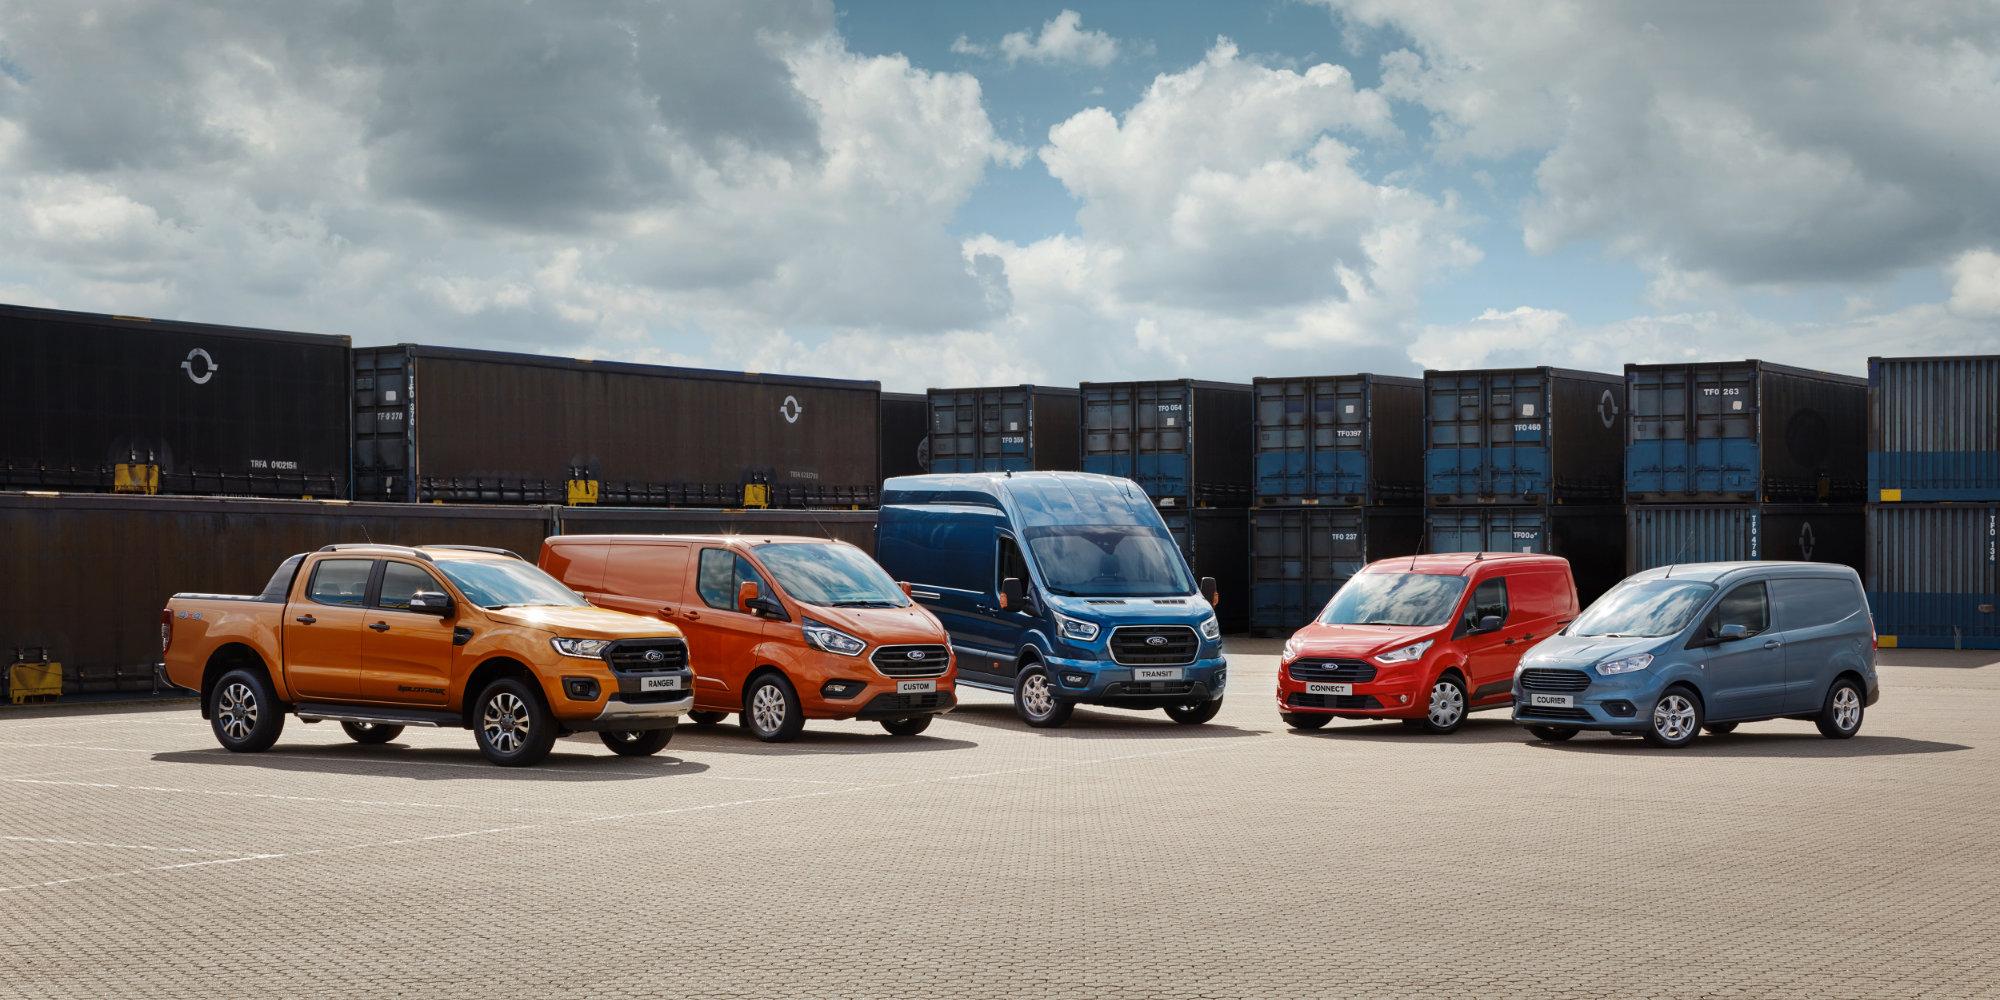 Ford Nutzfahrzeuge Jura-Garage Peter AG